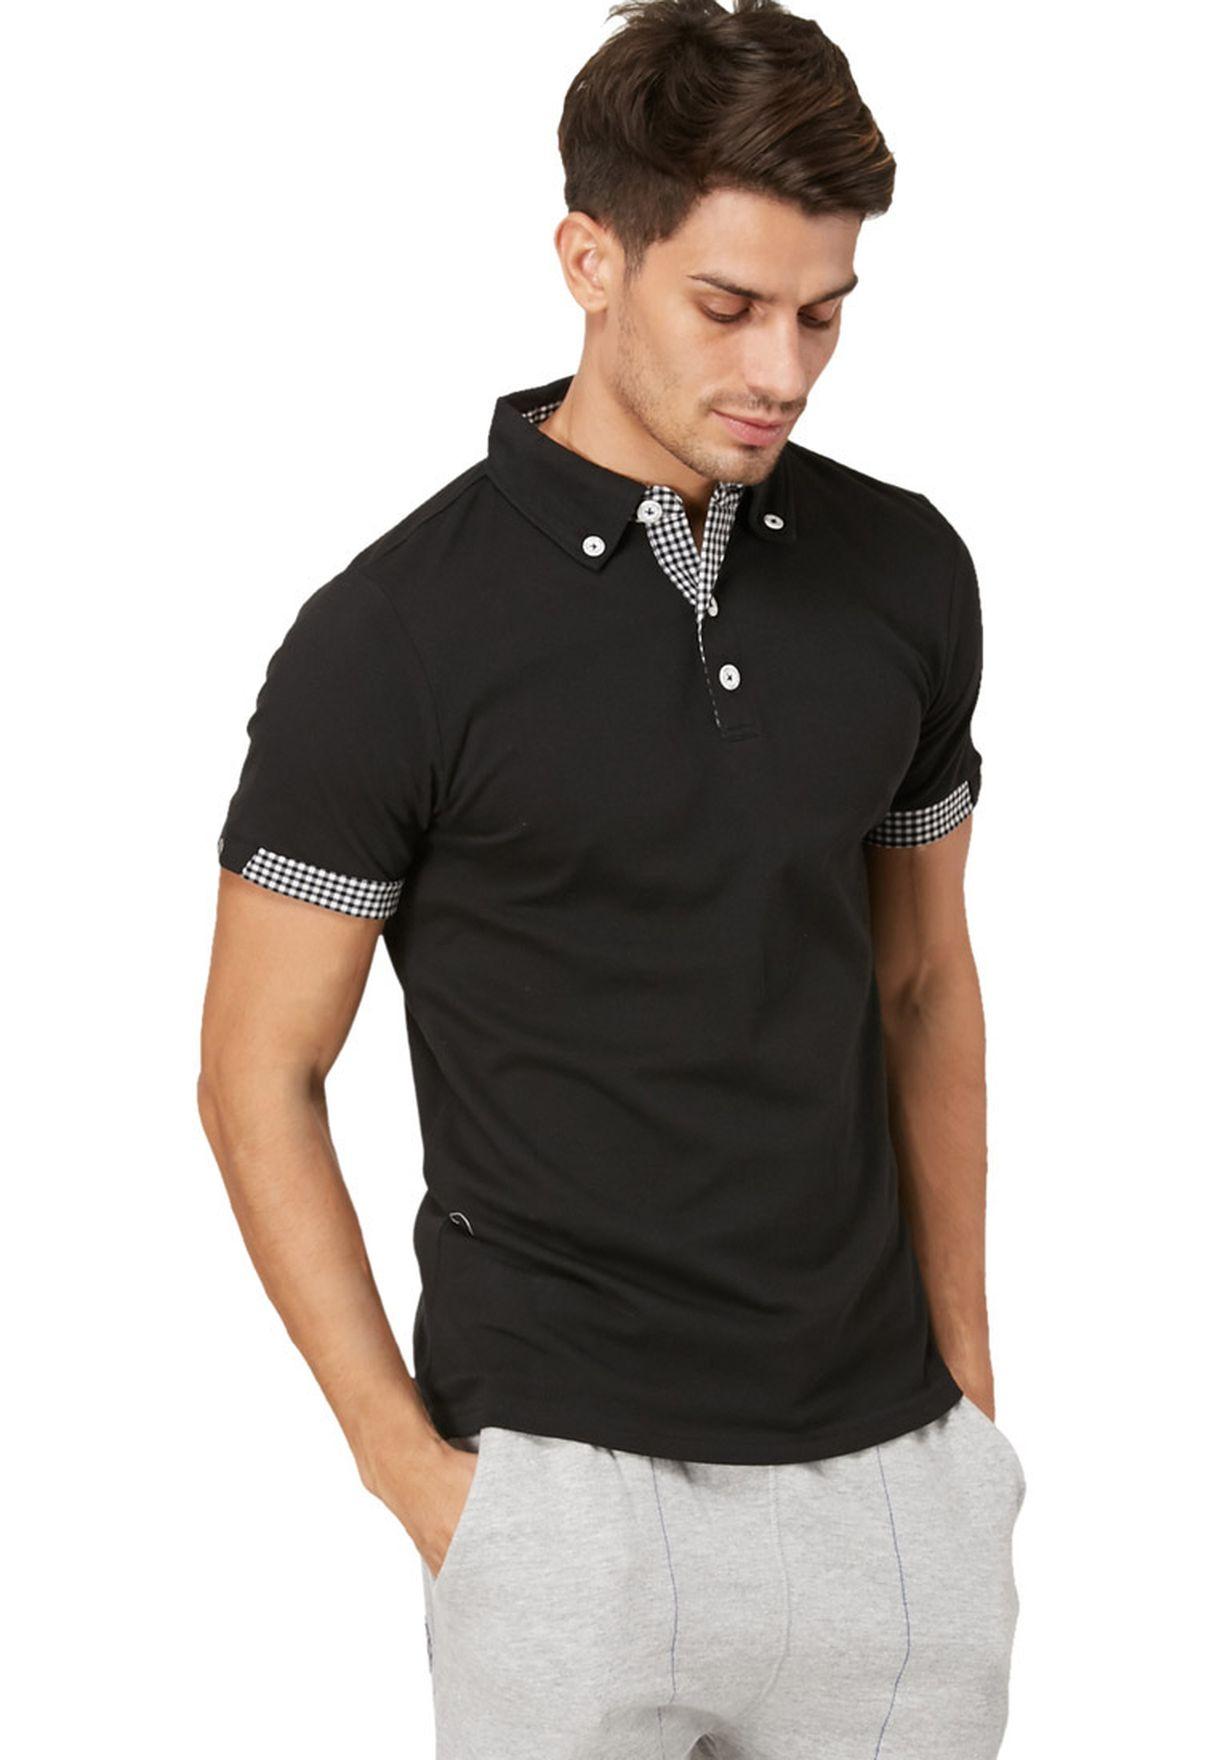 71ab235df تسوق قميص بولو Renzo من القطن البيكيه ماركة كارتر لون أسود في قطر ...